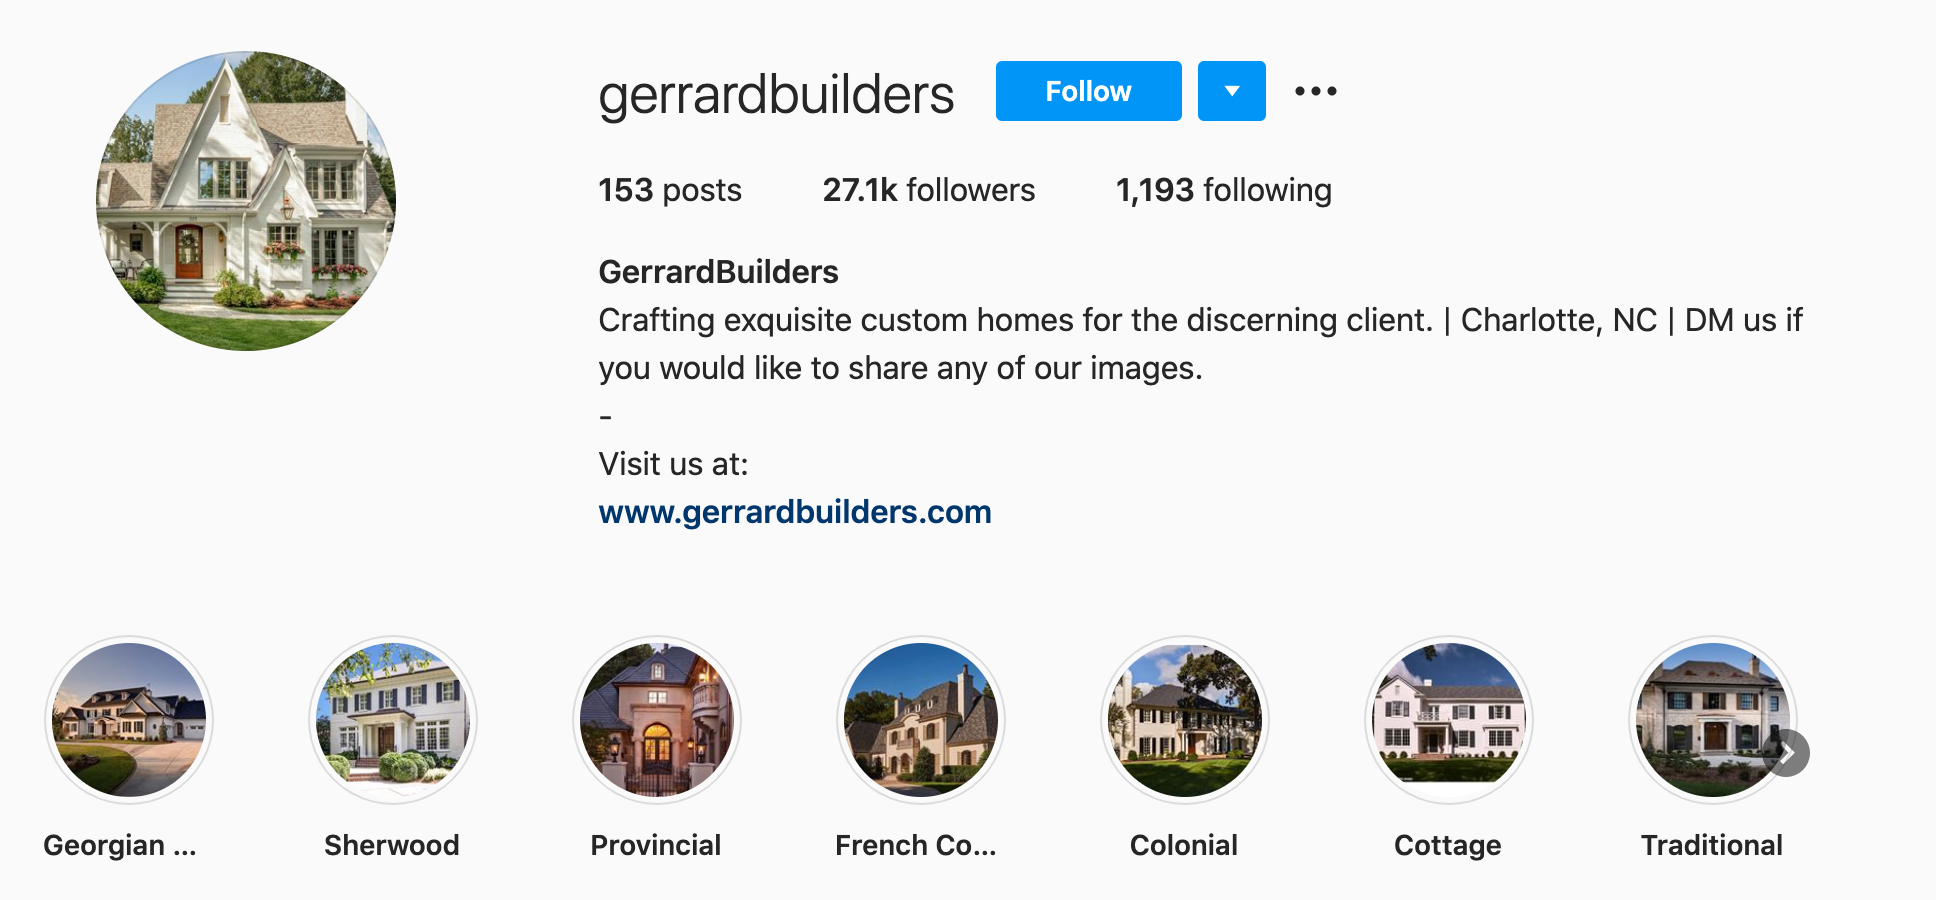 gerrardbuilders-instagram-profile